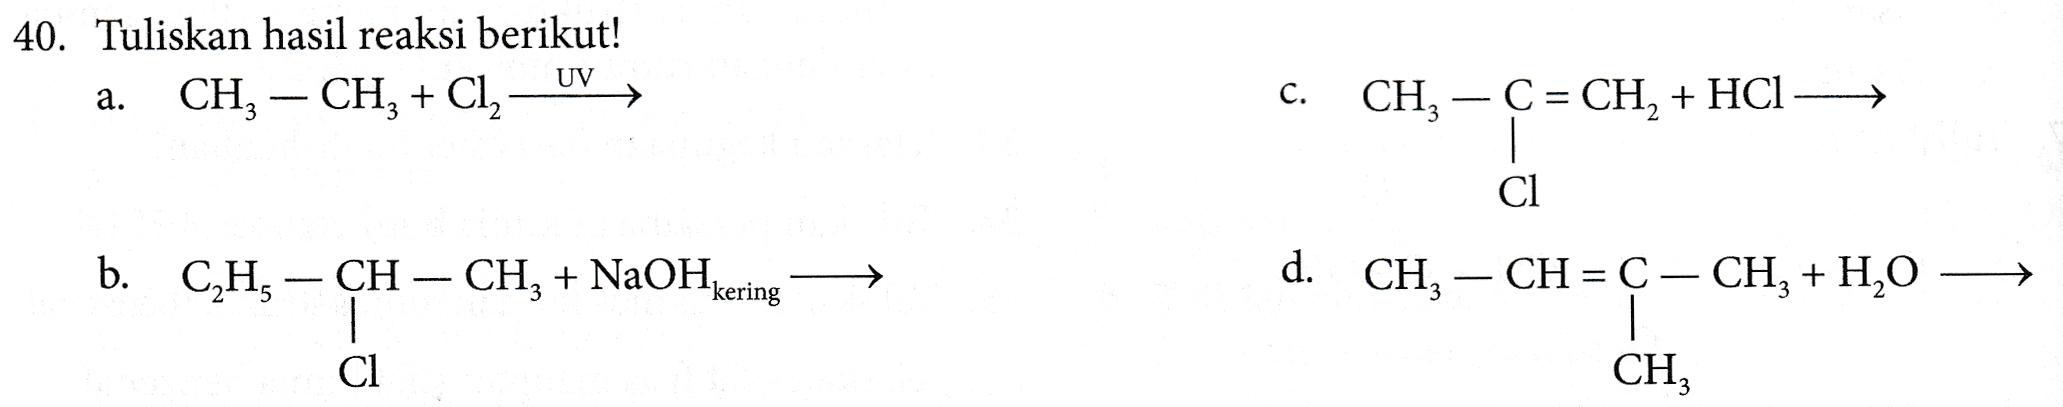 40. Tuliskan hasil reaksi berikut! a. CH3 – CH2 + Cl2 — UV C. CH— C = CH, + HCl Cl b. CH CH, – CH – CH2 + NaOHkering d. CH – CH = C – CH3 + H20 1 Cl CH;